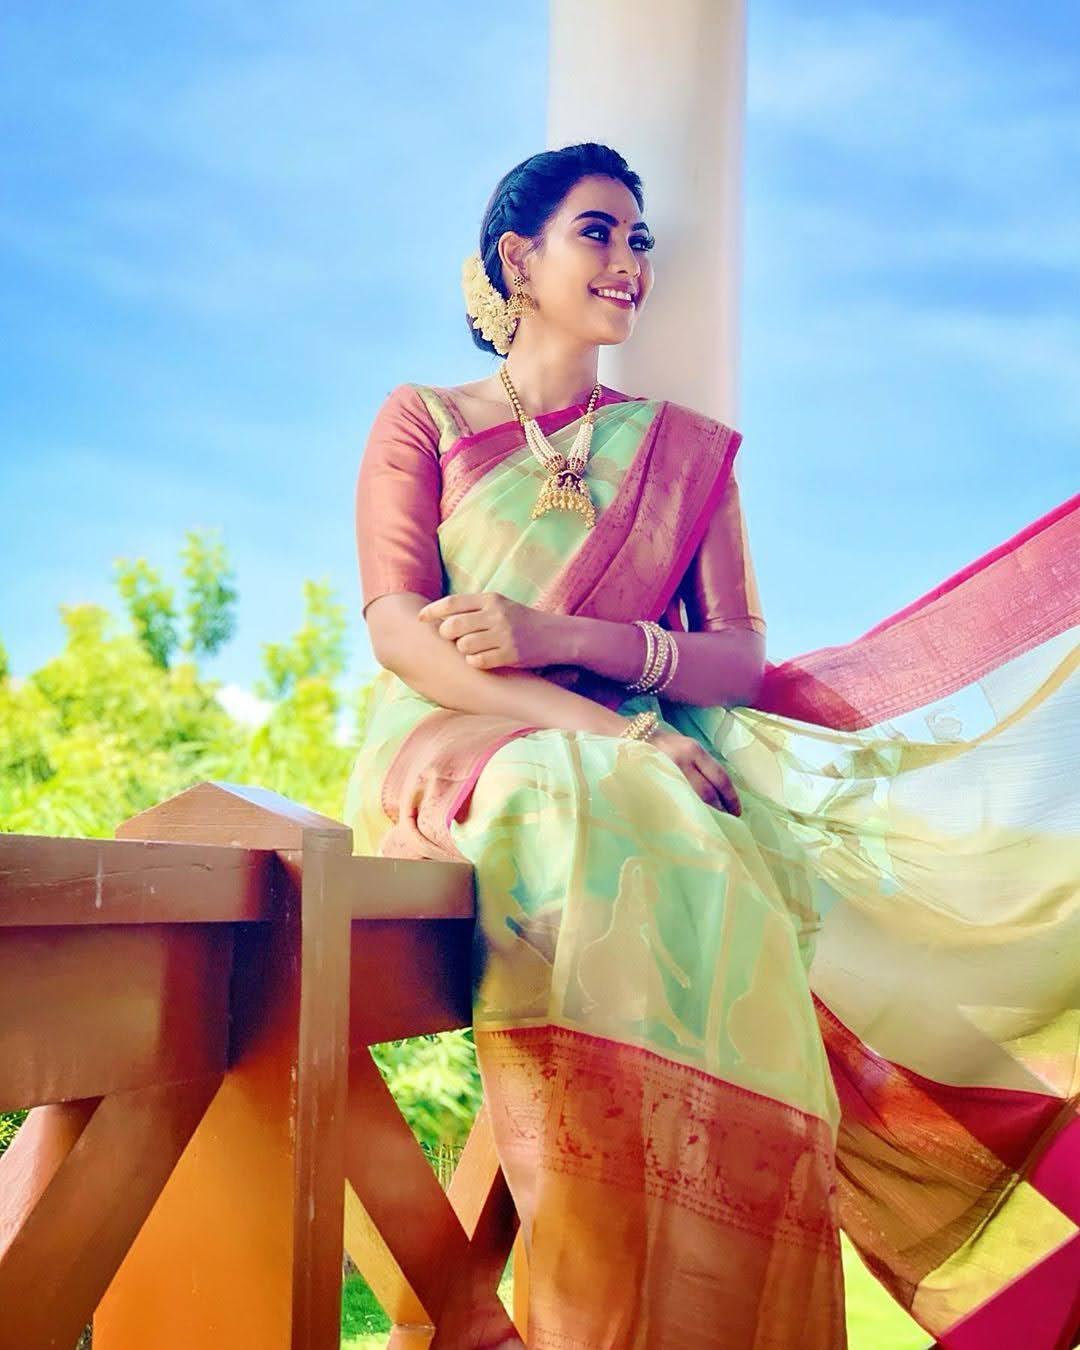 pavithra-janani-64664